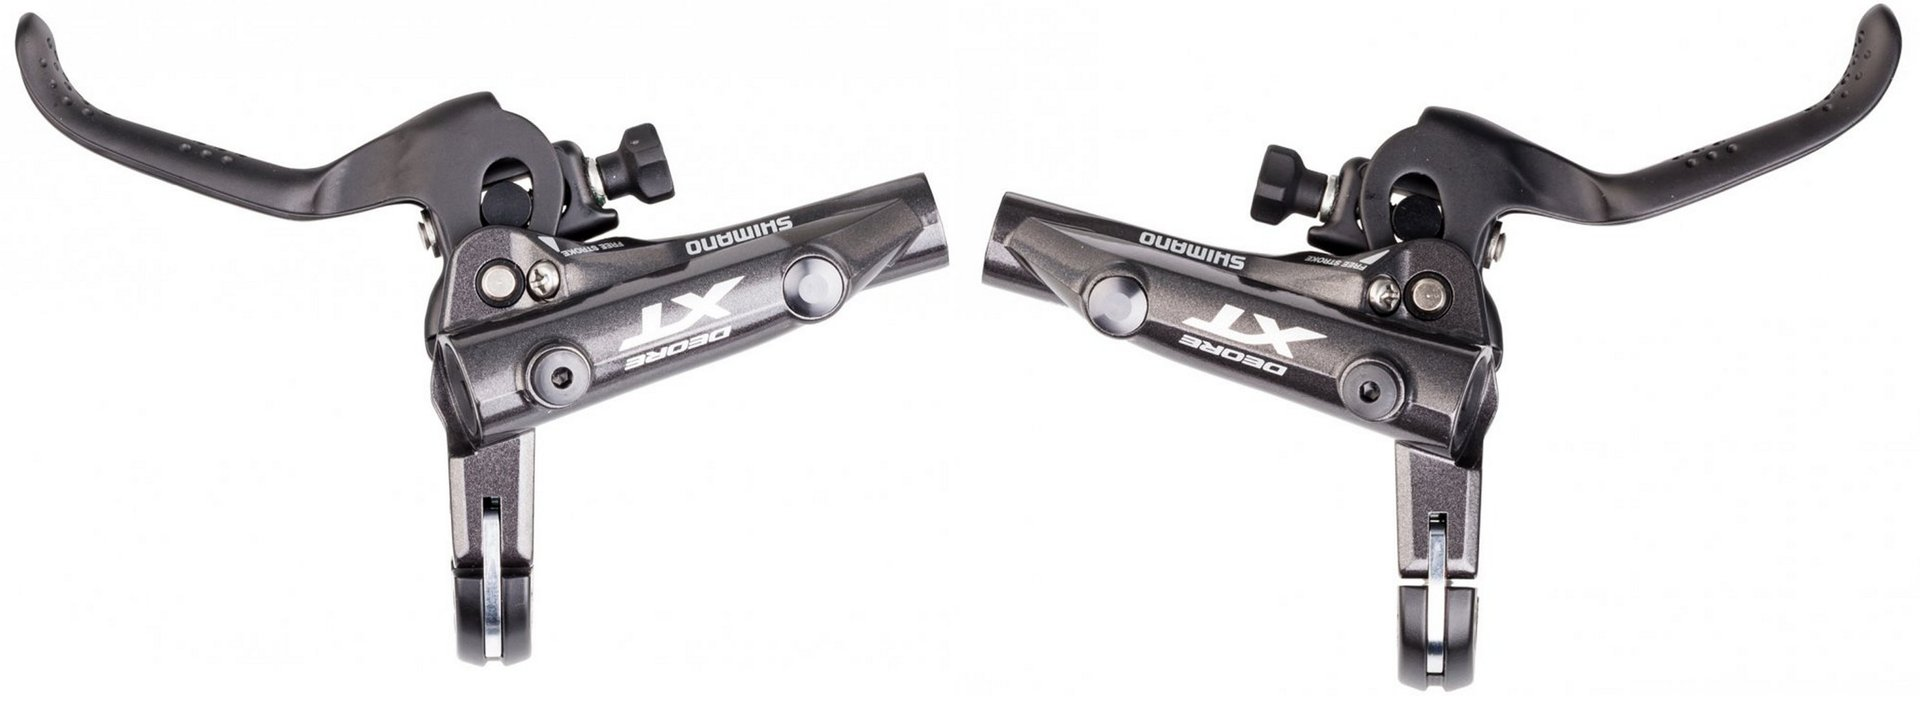 Shimano Deore XT BL-M8000 Bremshebel